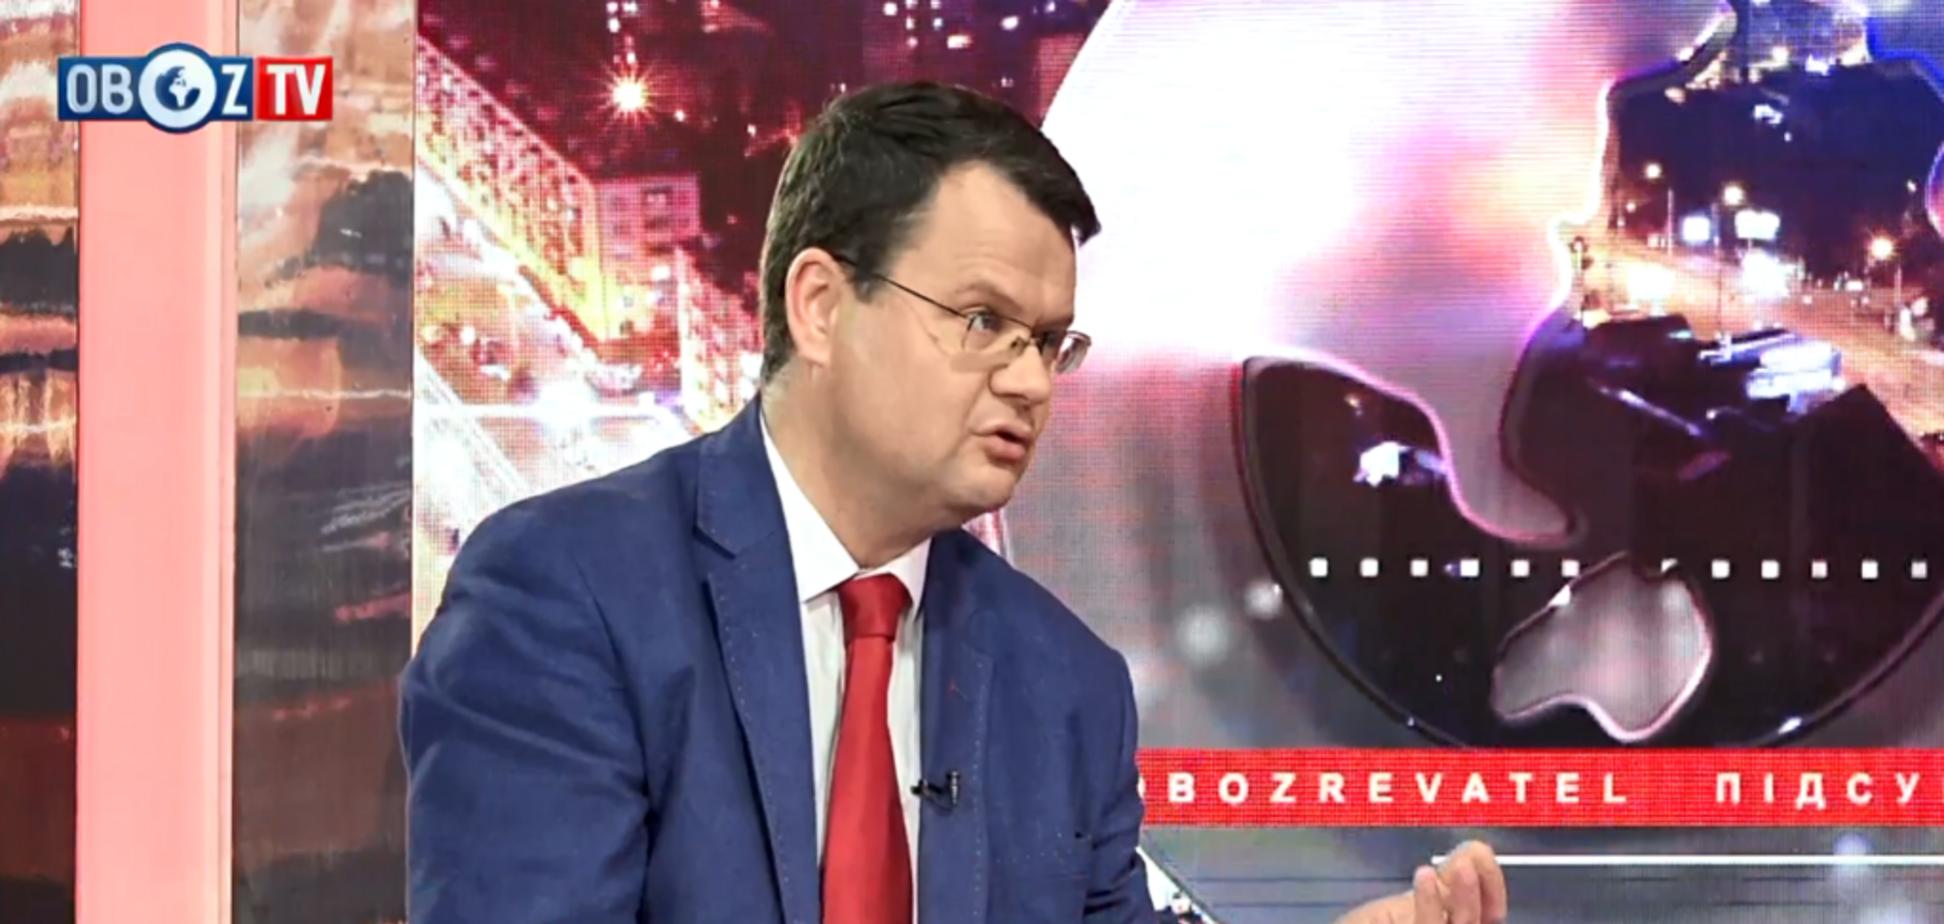 Доллар в Украине подорожает: озвучен прогноз до конца года